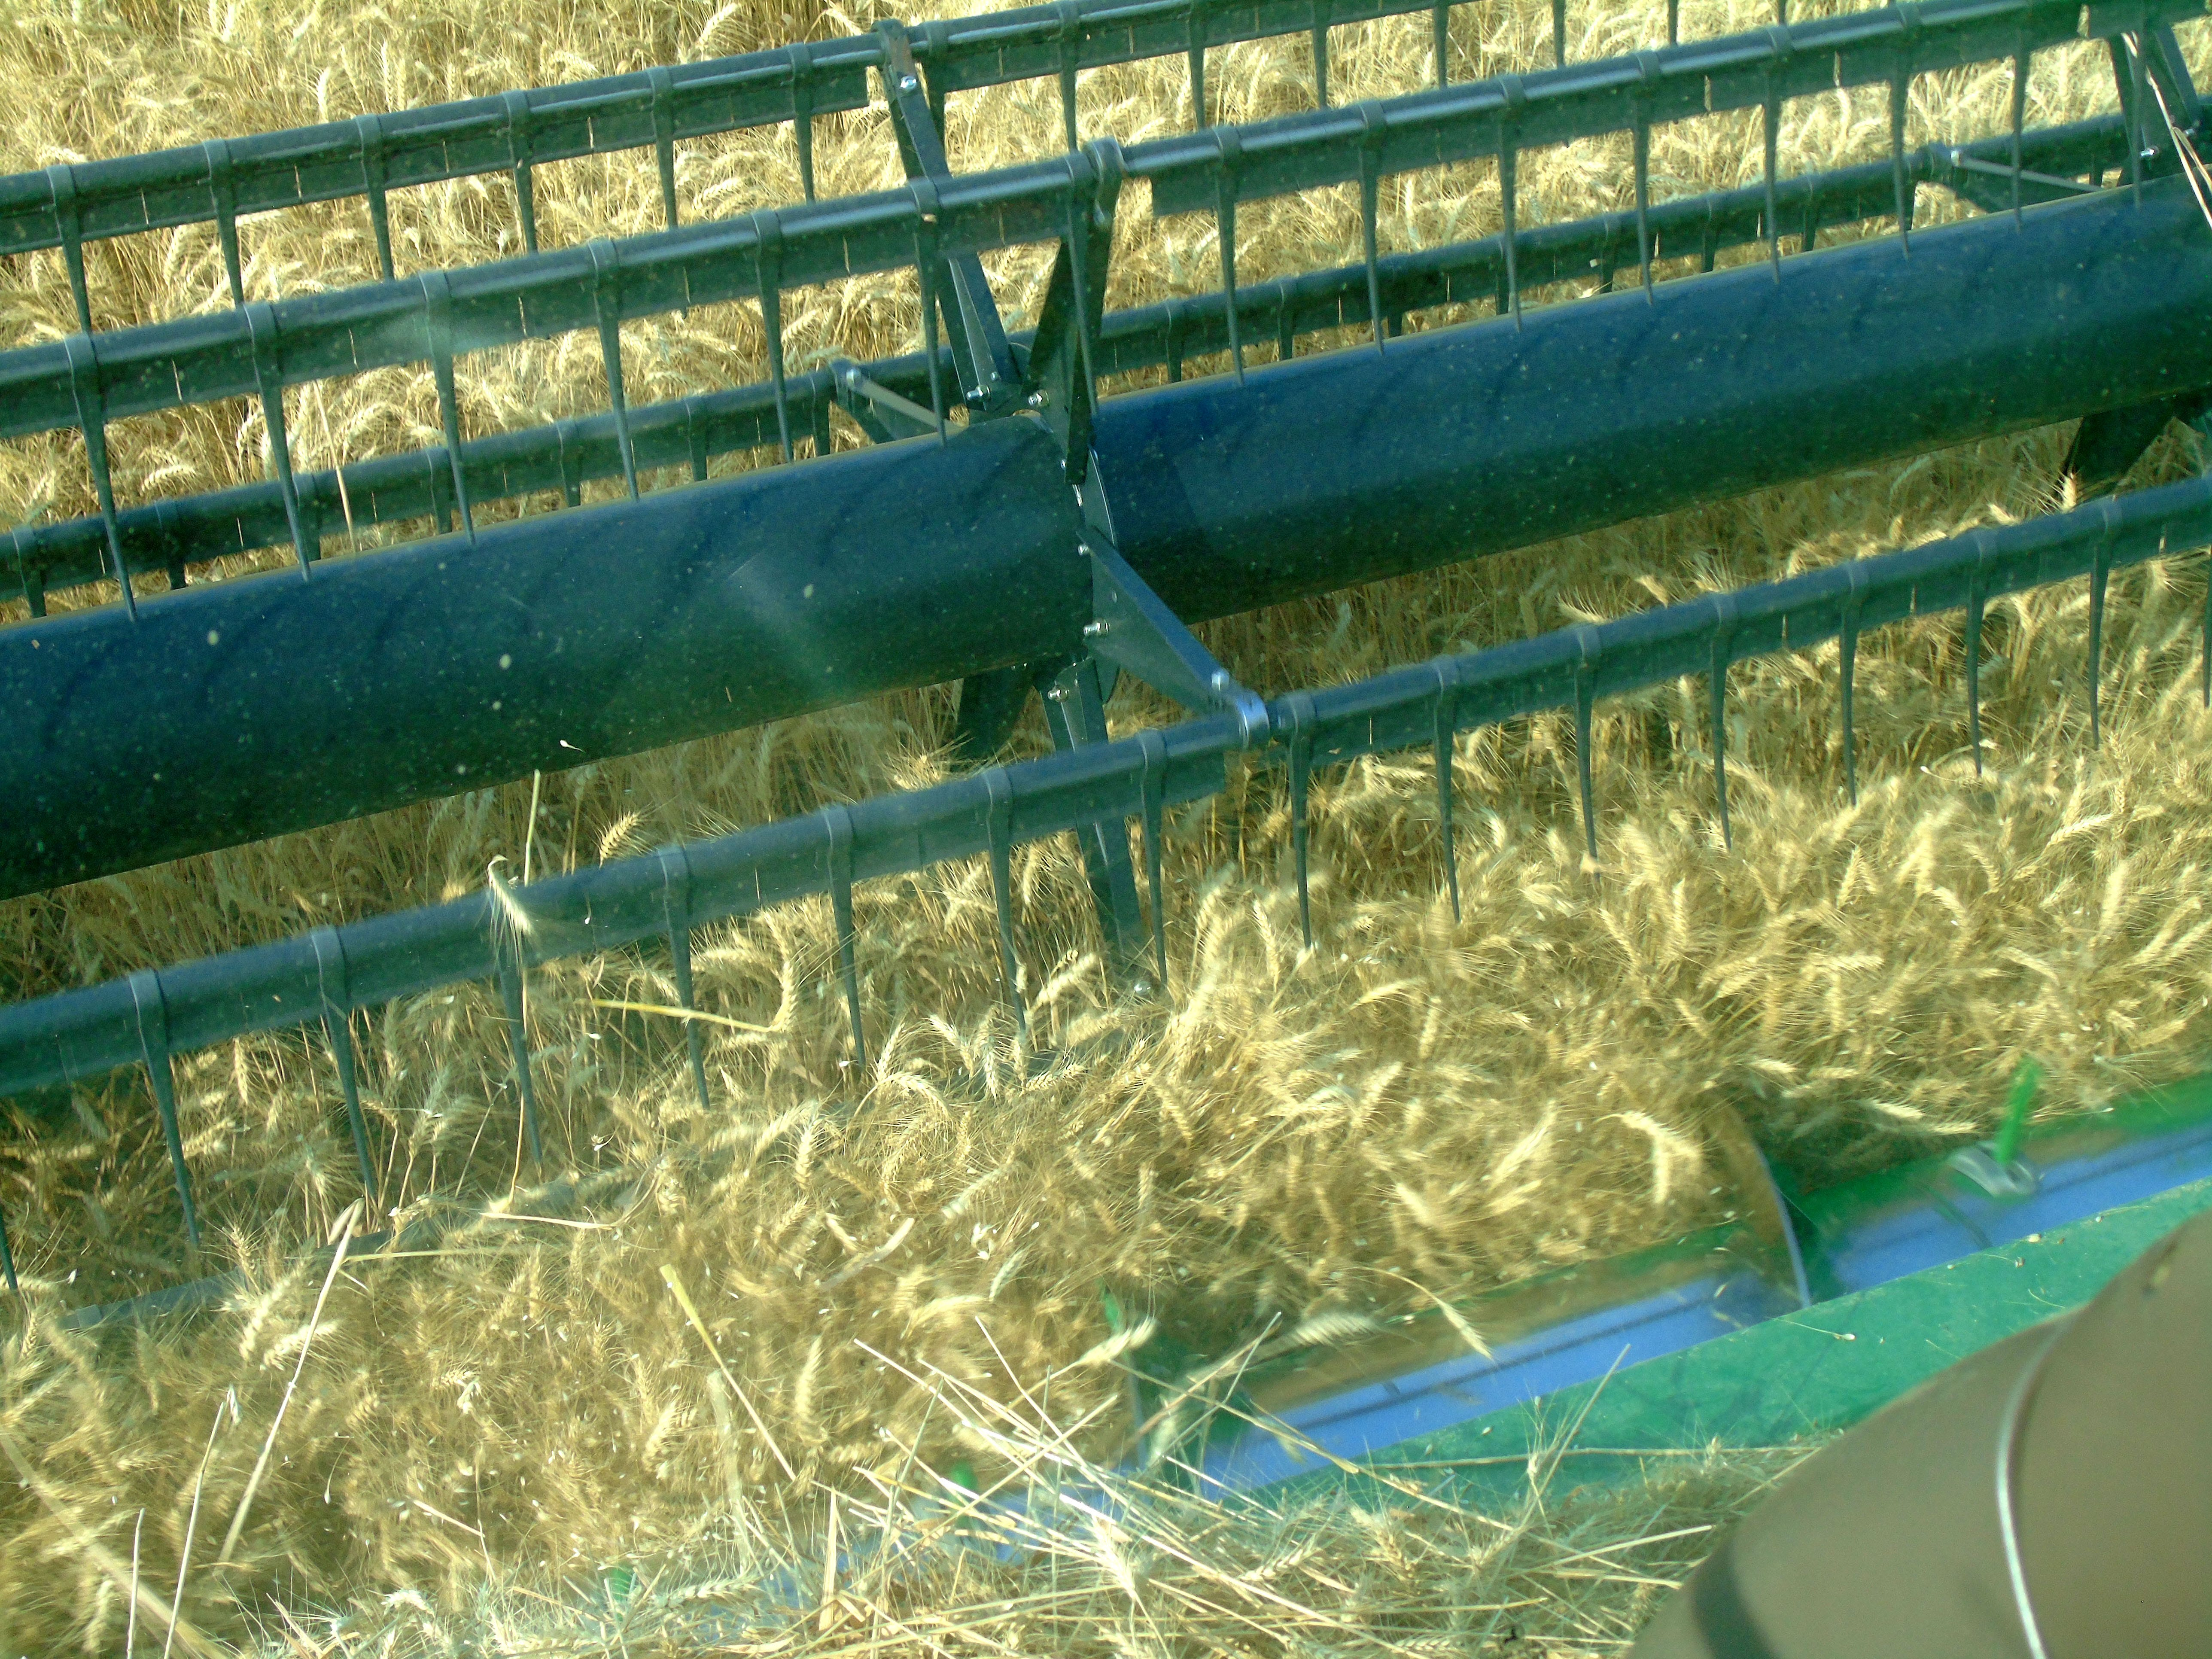 Kallan Bahnmiller harvests winter wheat south of Big Sandy.